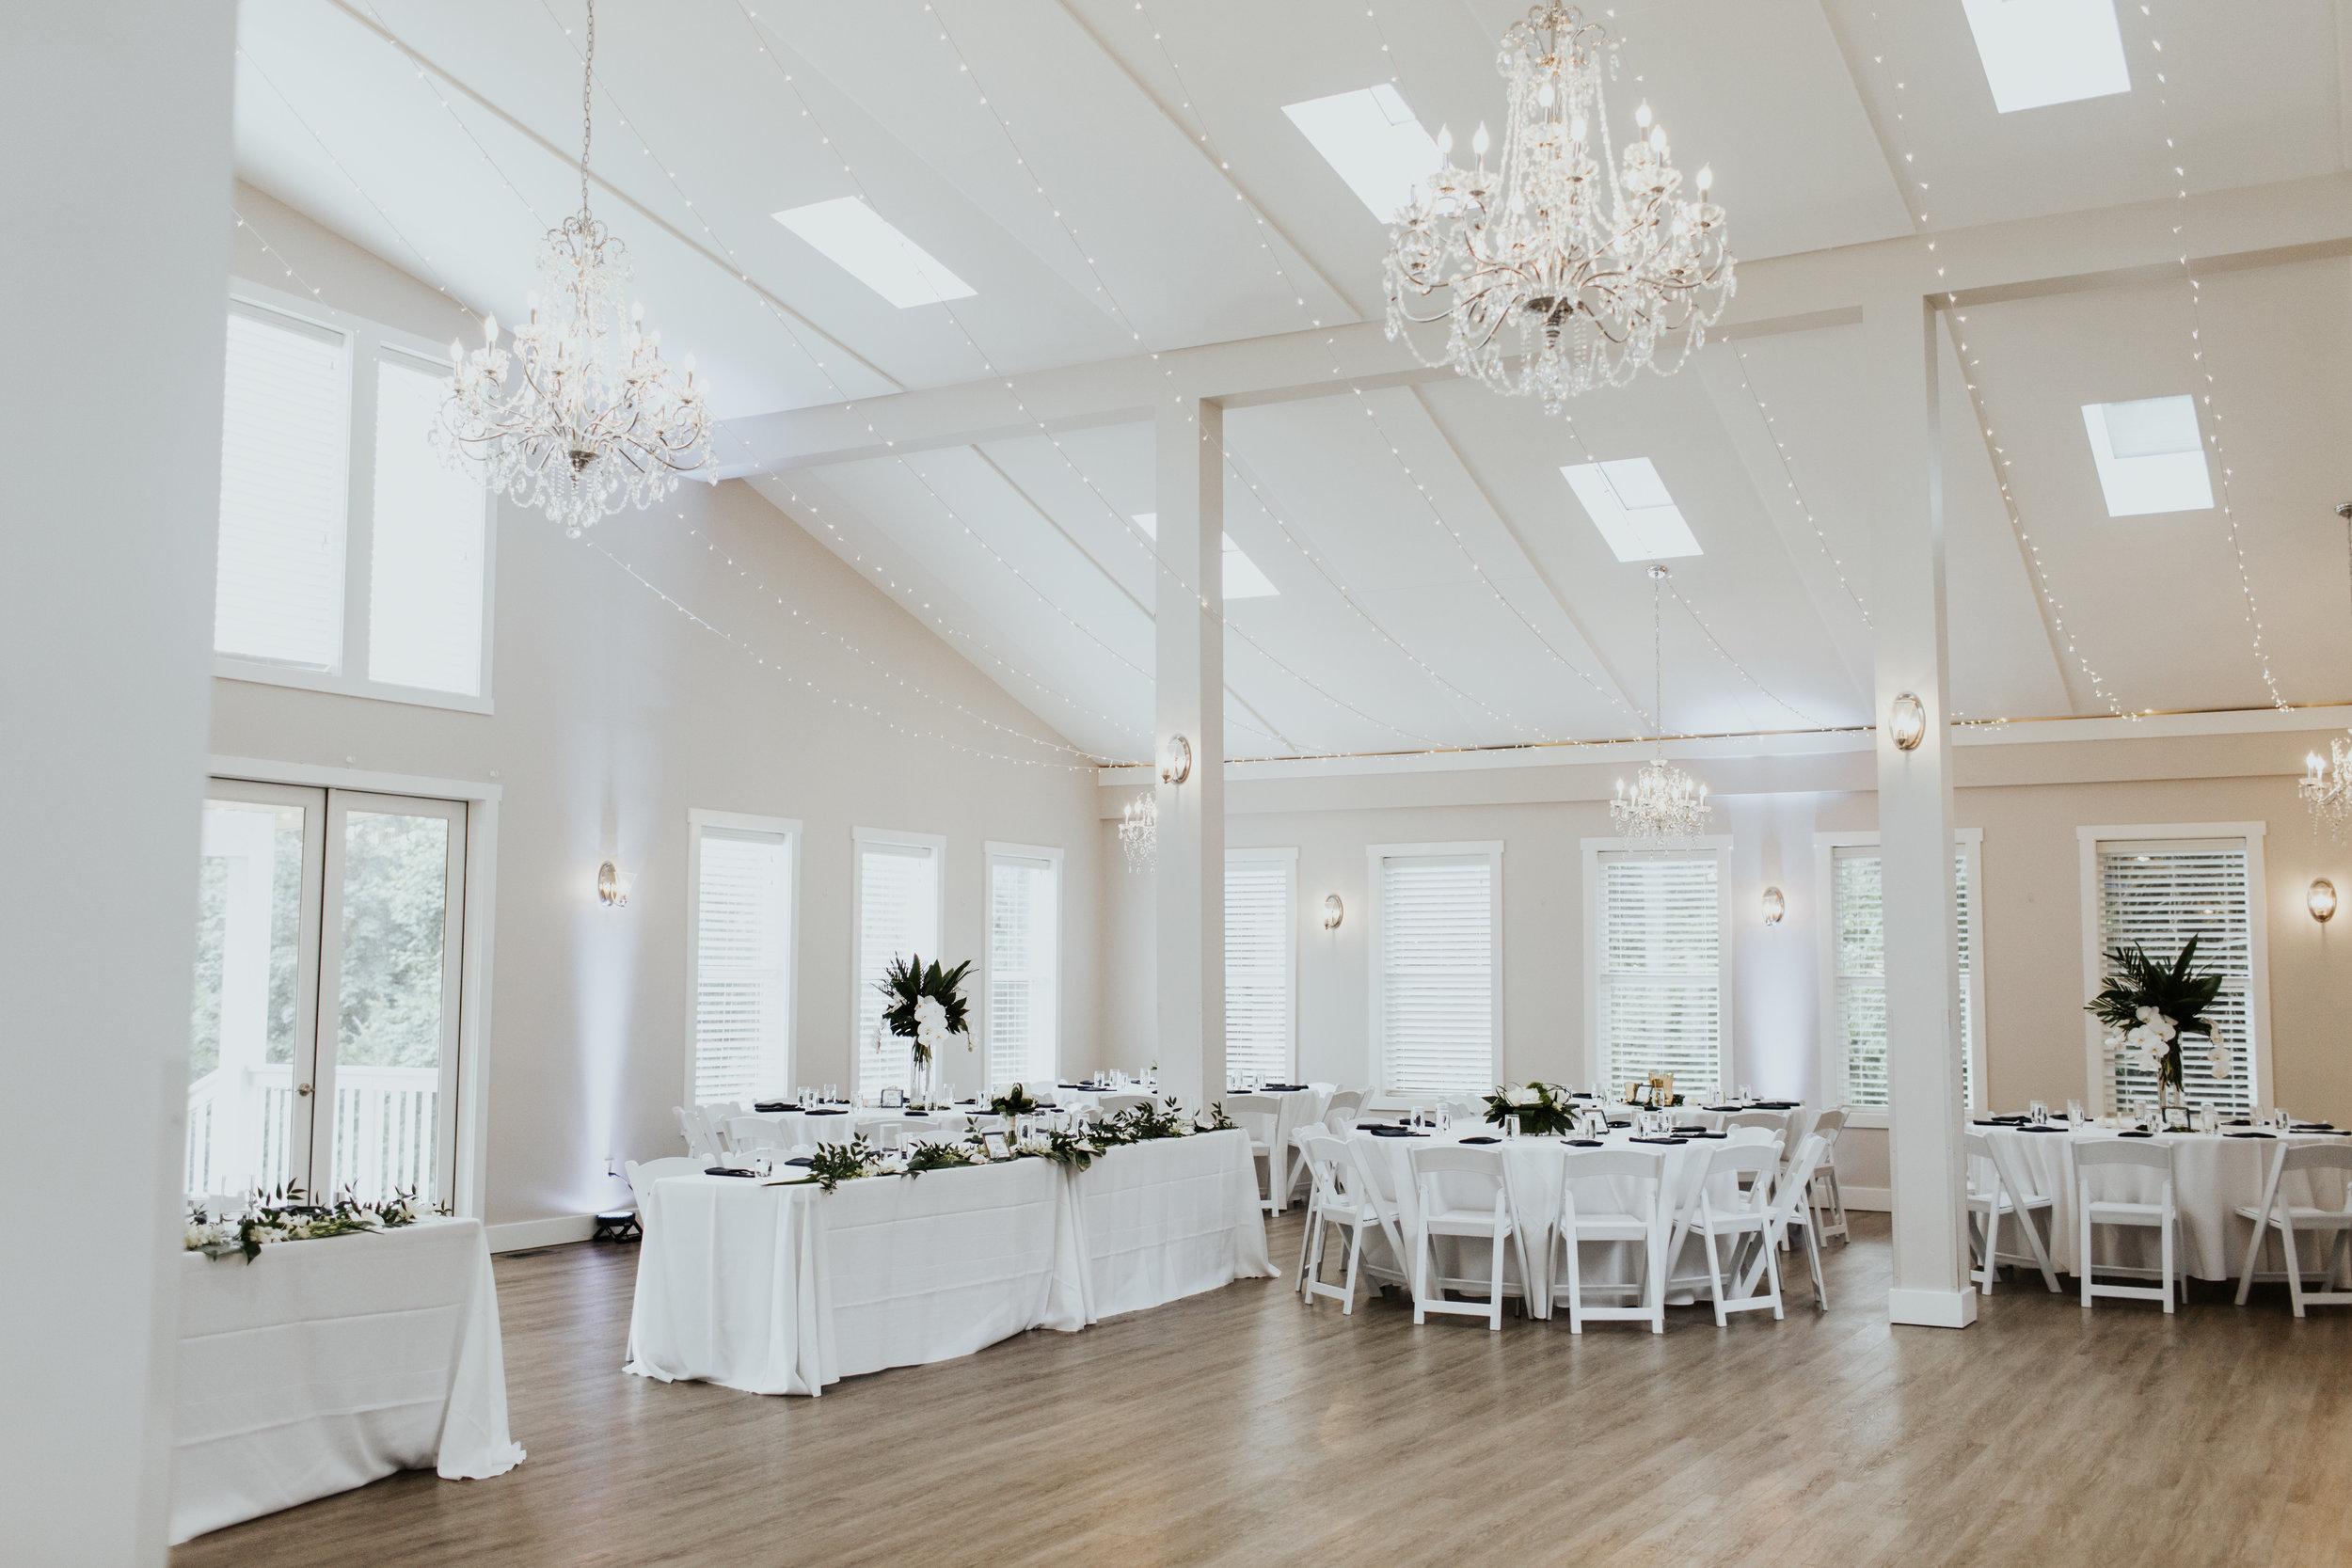 ginapaulson_eriksarah_wedding-790.jpg